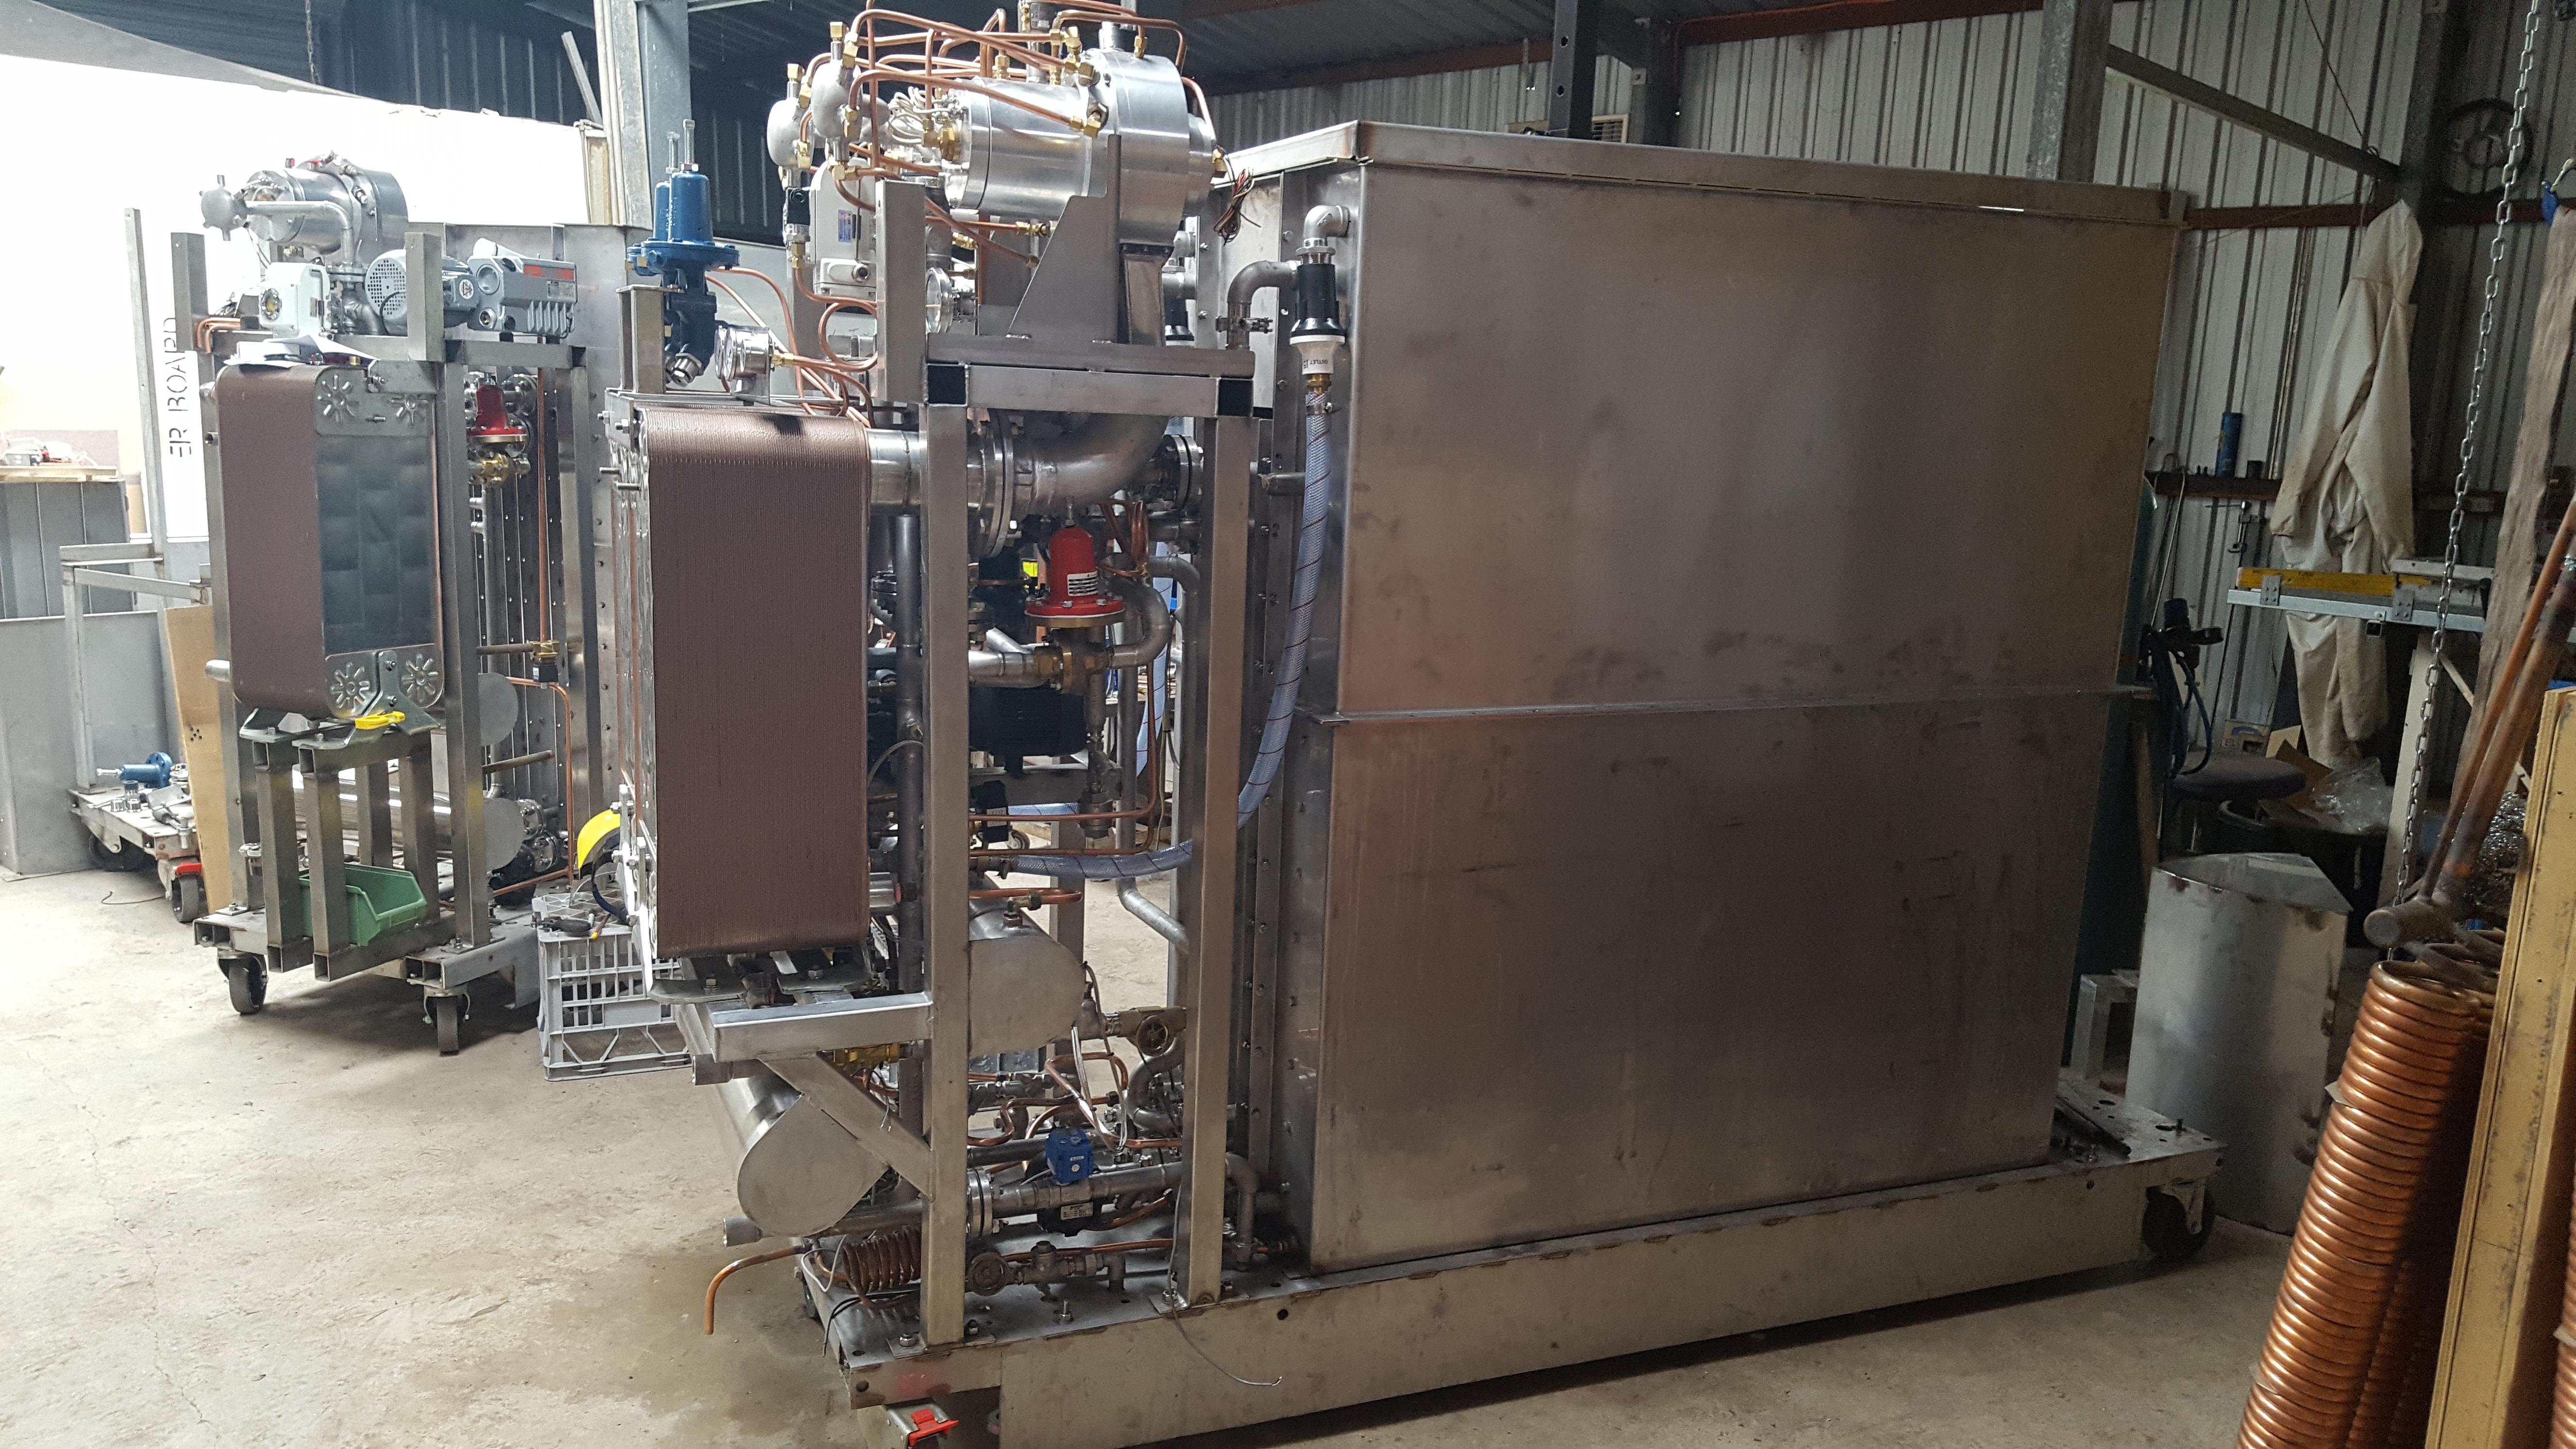 15 - 30 kWe CHP system